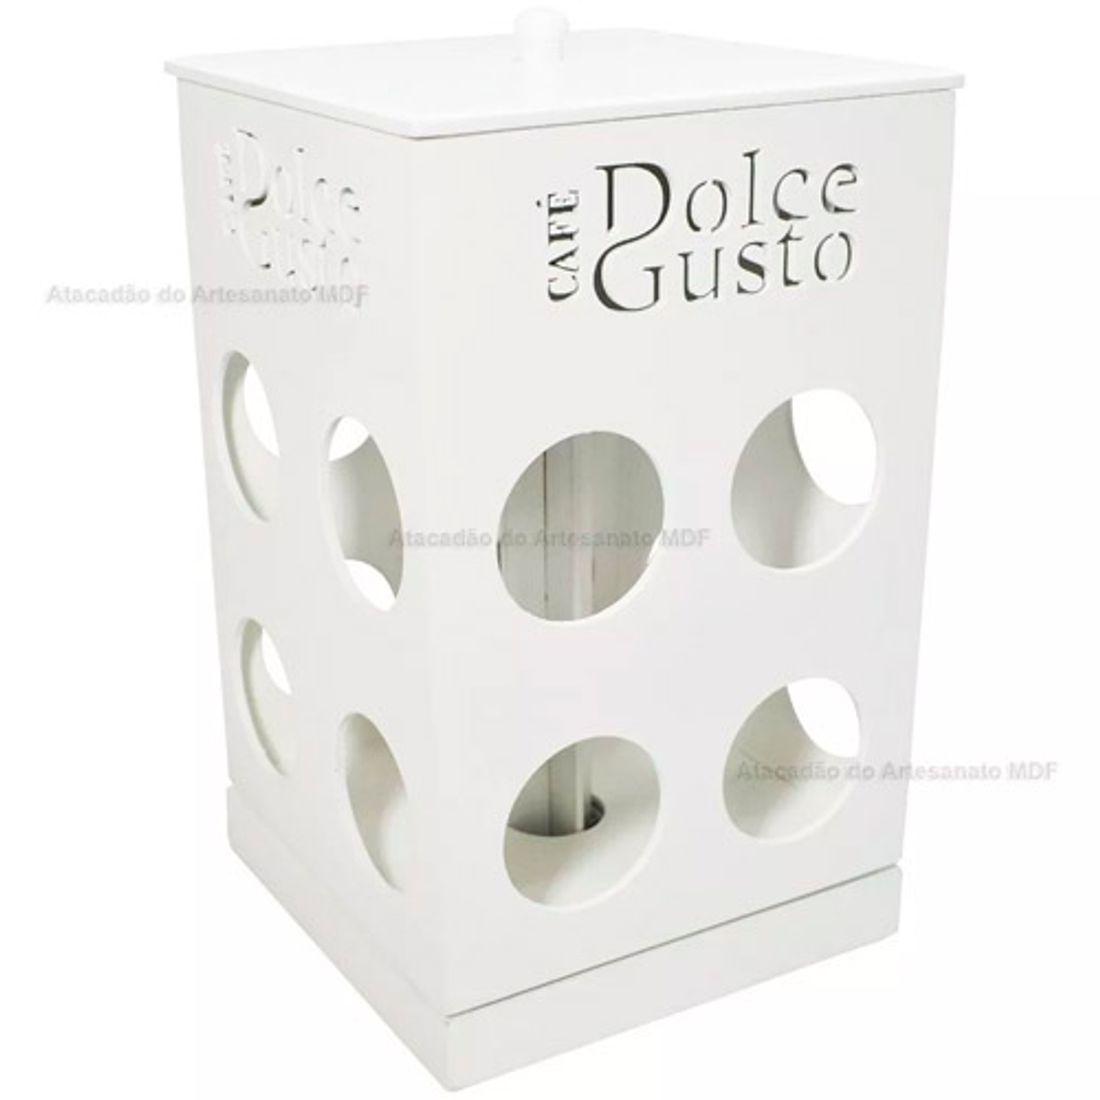 Porta-Capsulas-Giratorio-Dolce-Gusto-Pintado-23x14x14-Mdf